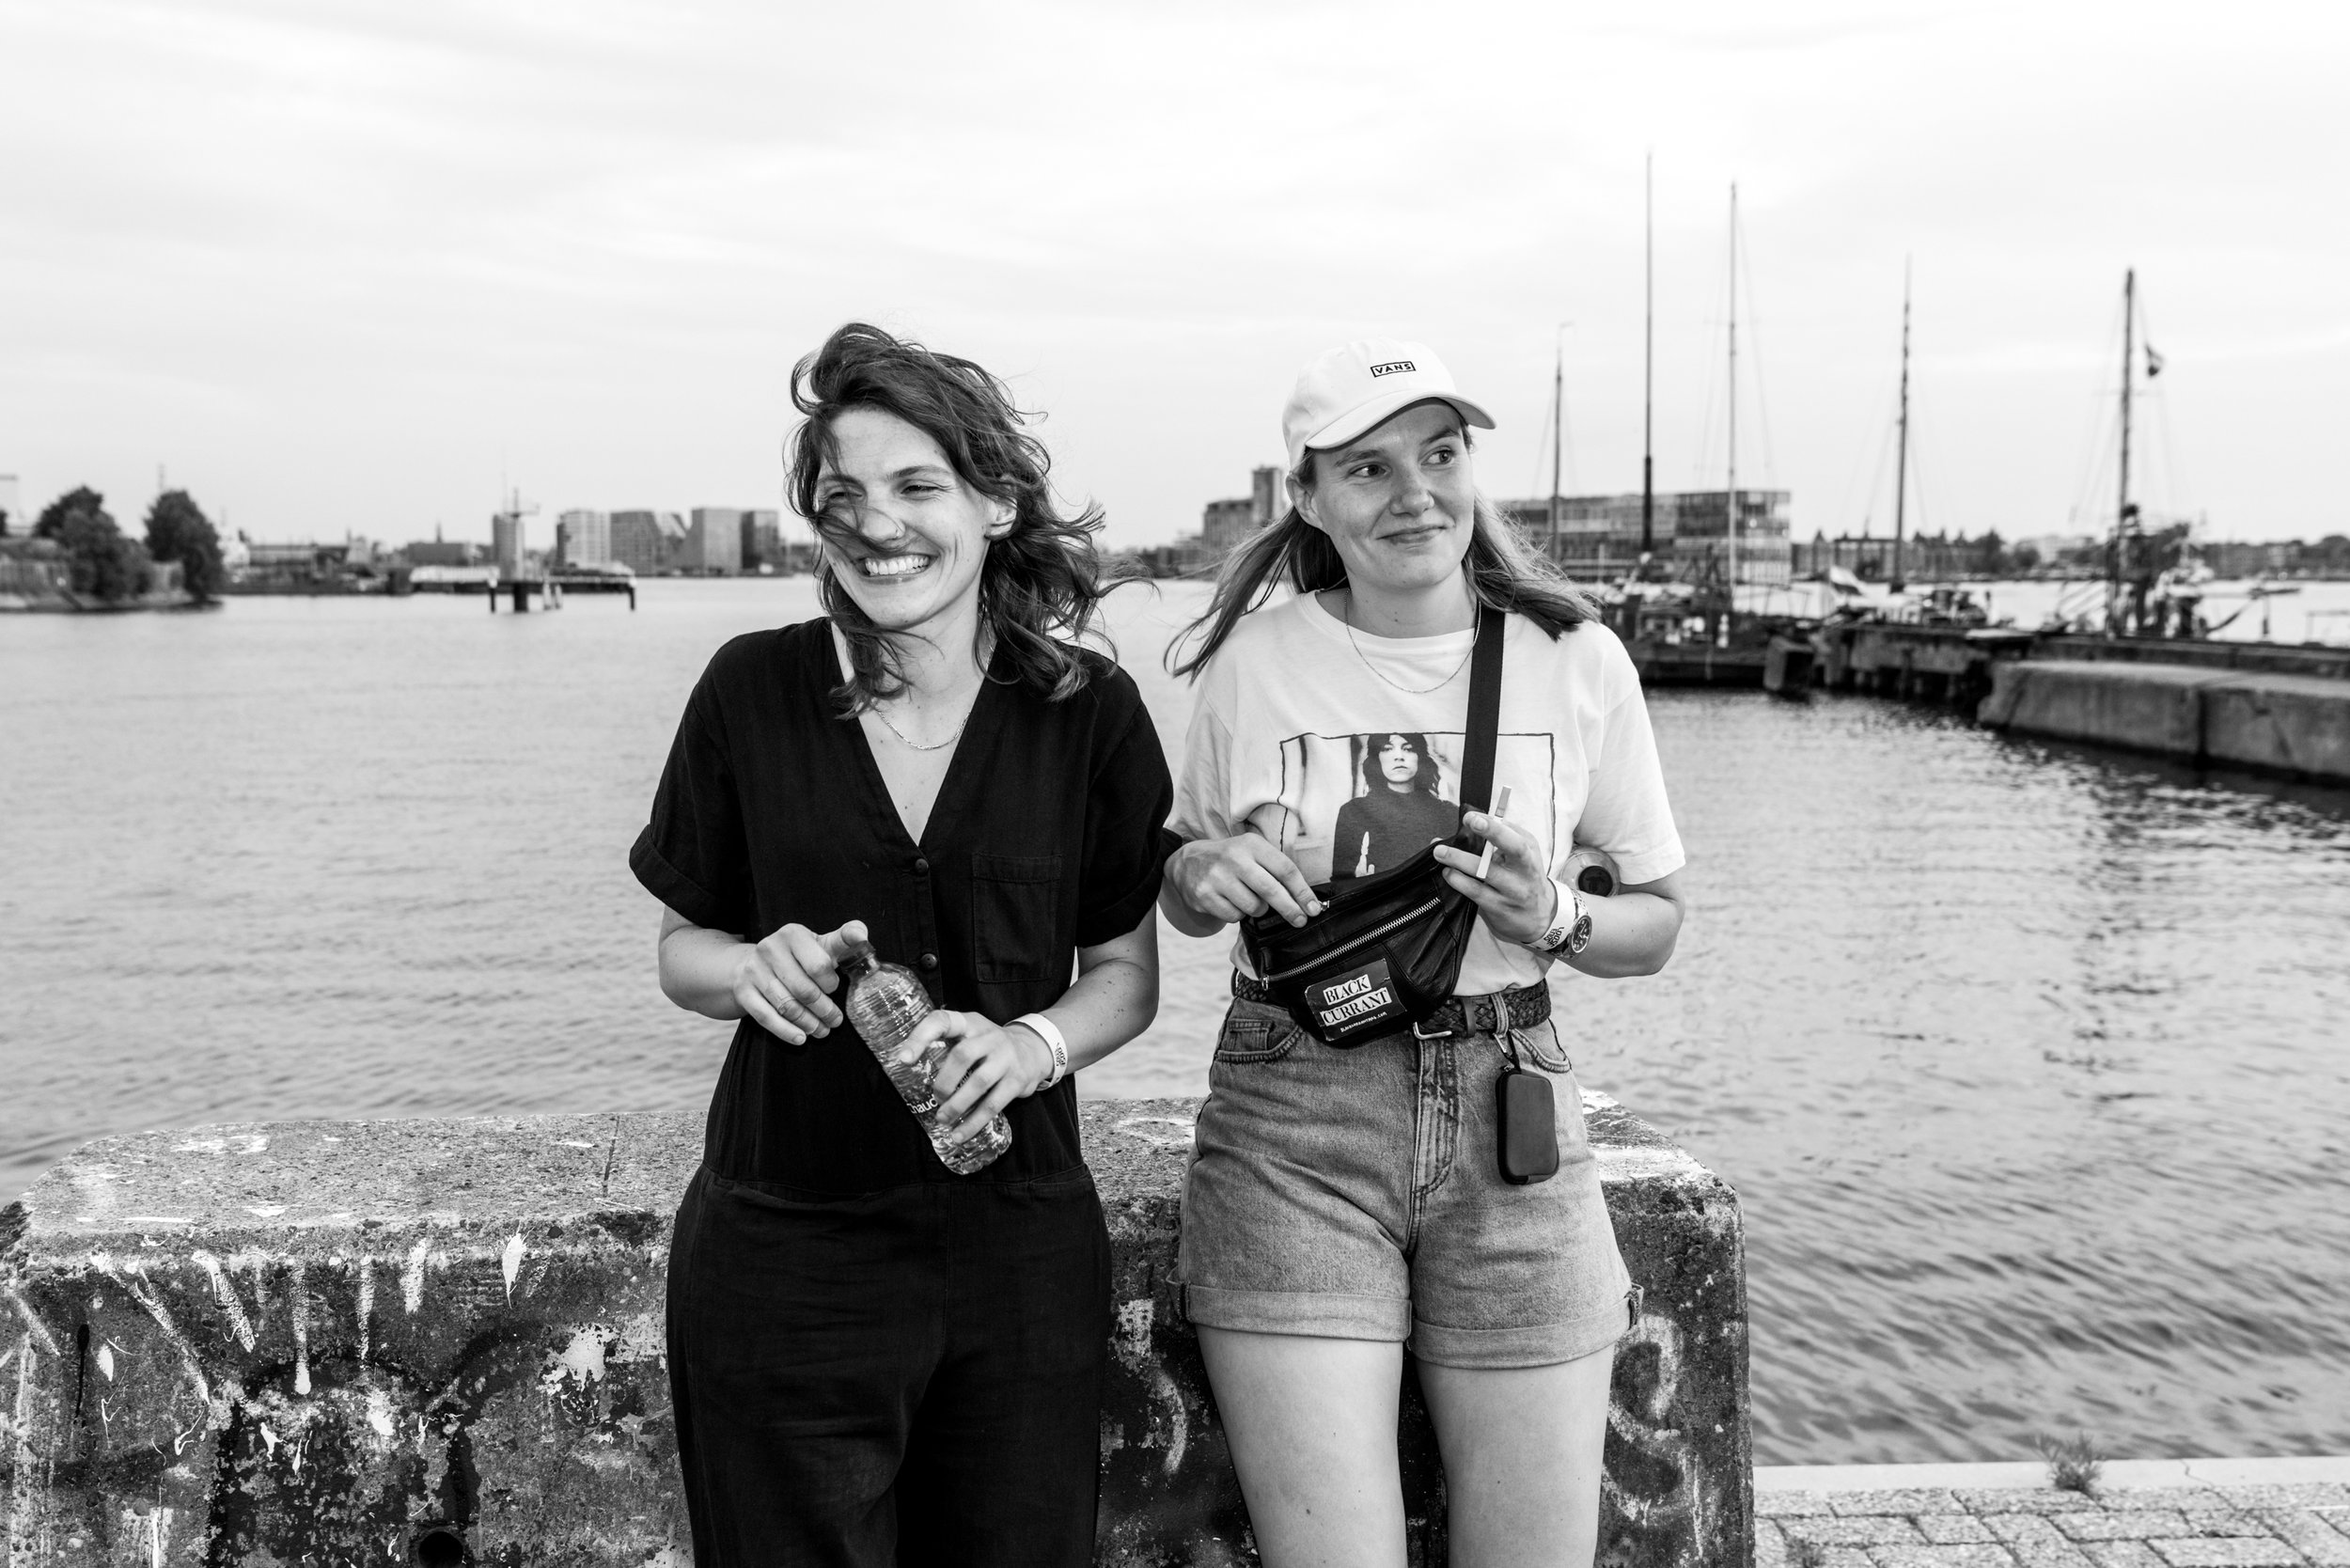 Soesja & Noortje (Charlie & The Lesbians) 2019